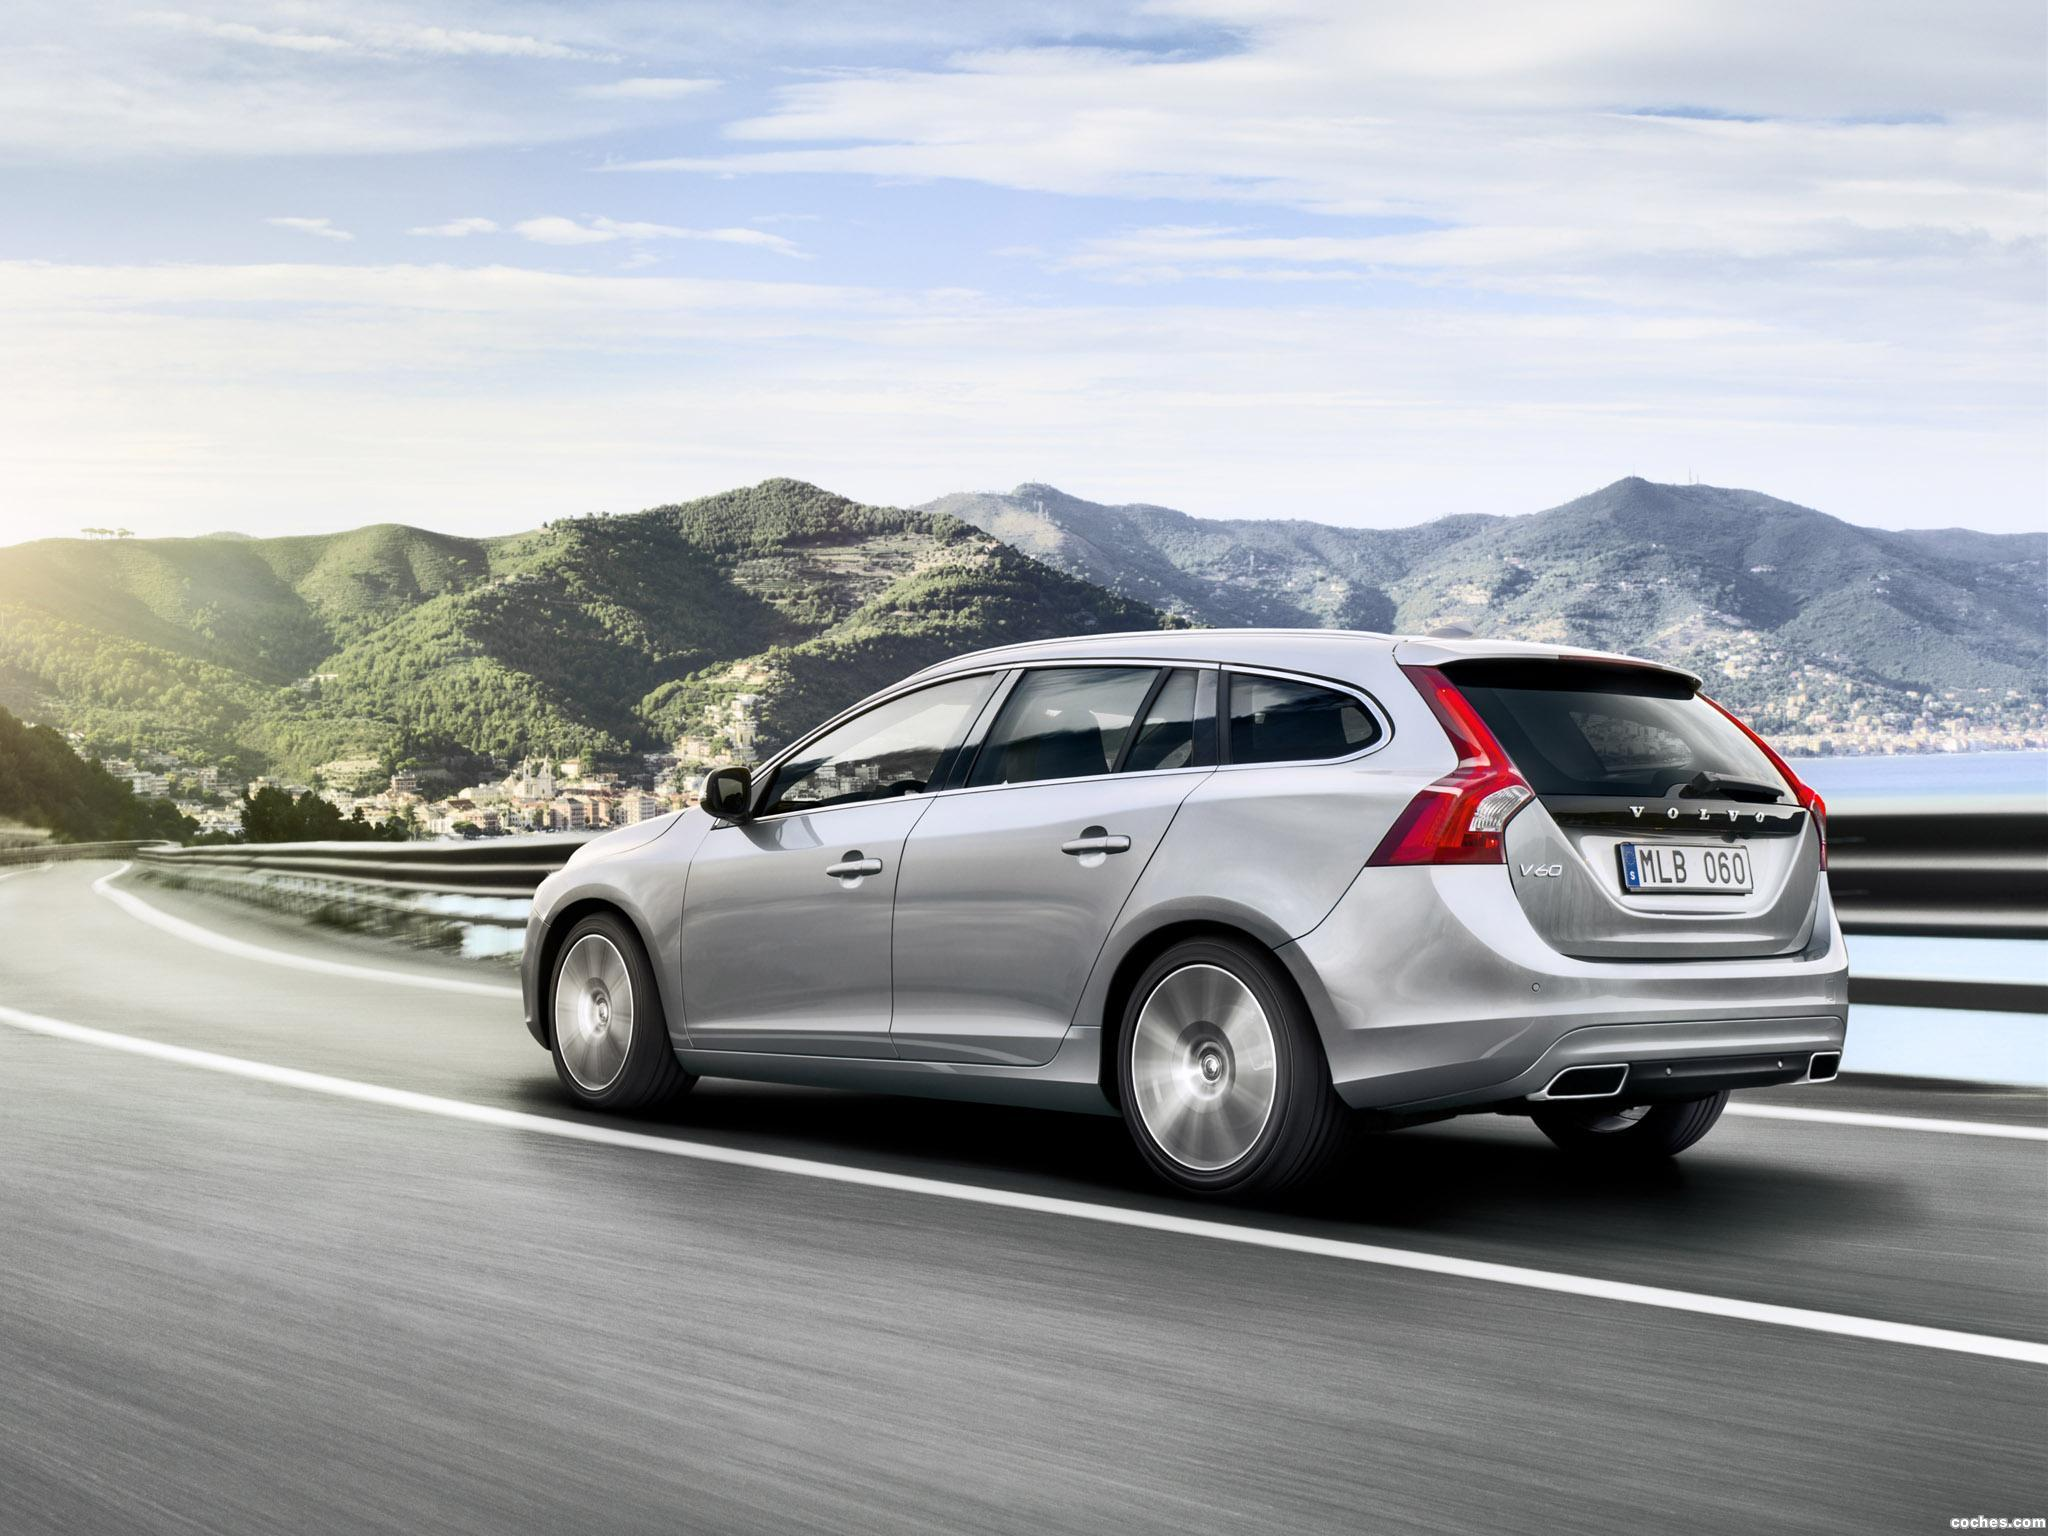 Foto 2 de Volvo V60 2013